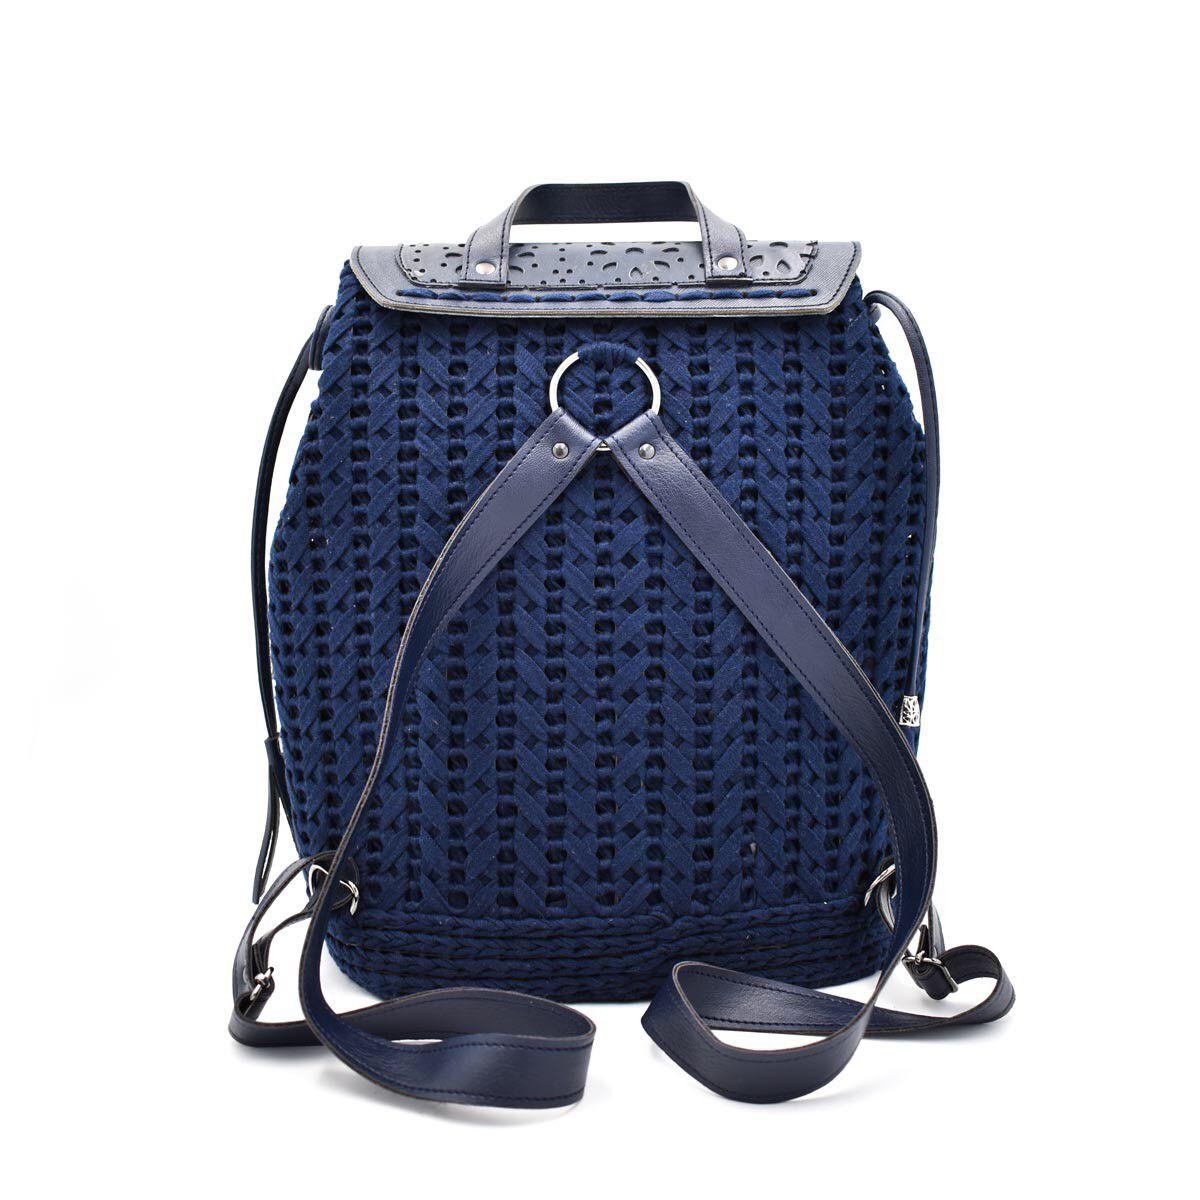 eb15ec5f70 Χειροποίητη πλεκτή τσάντα πλάτης Μπλέ - Idea Hellas